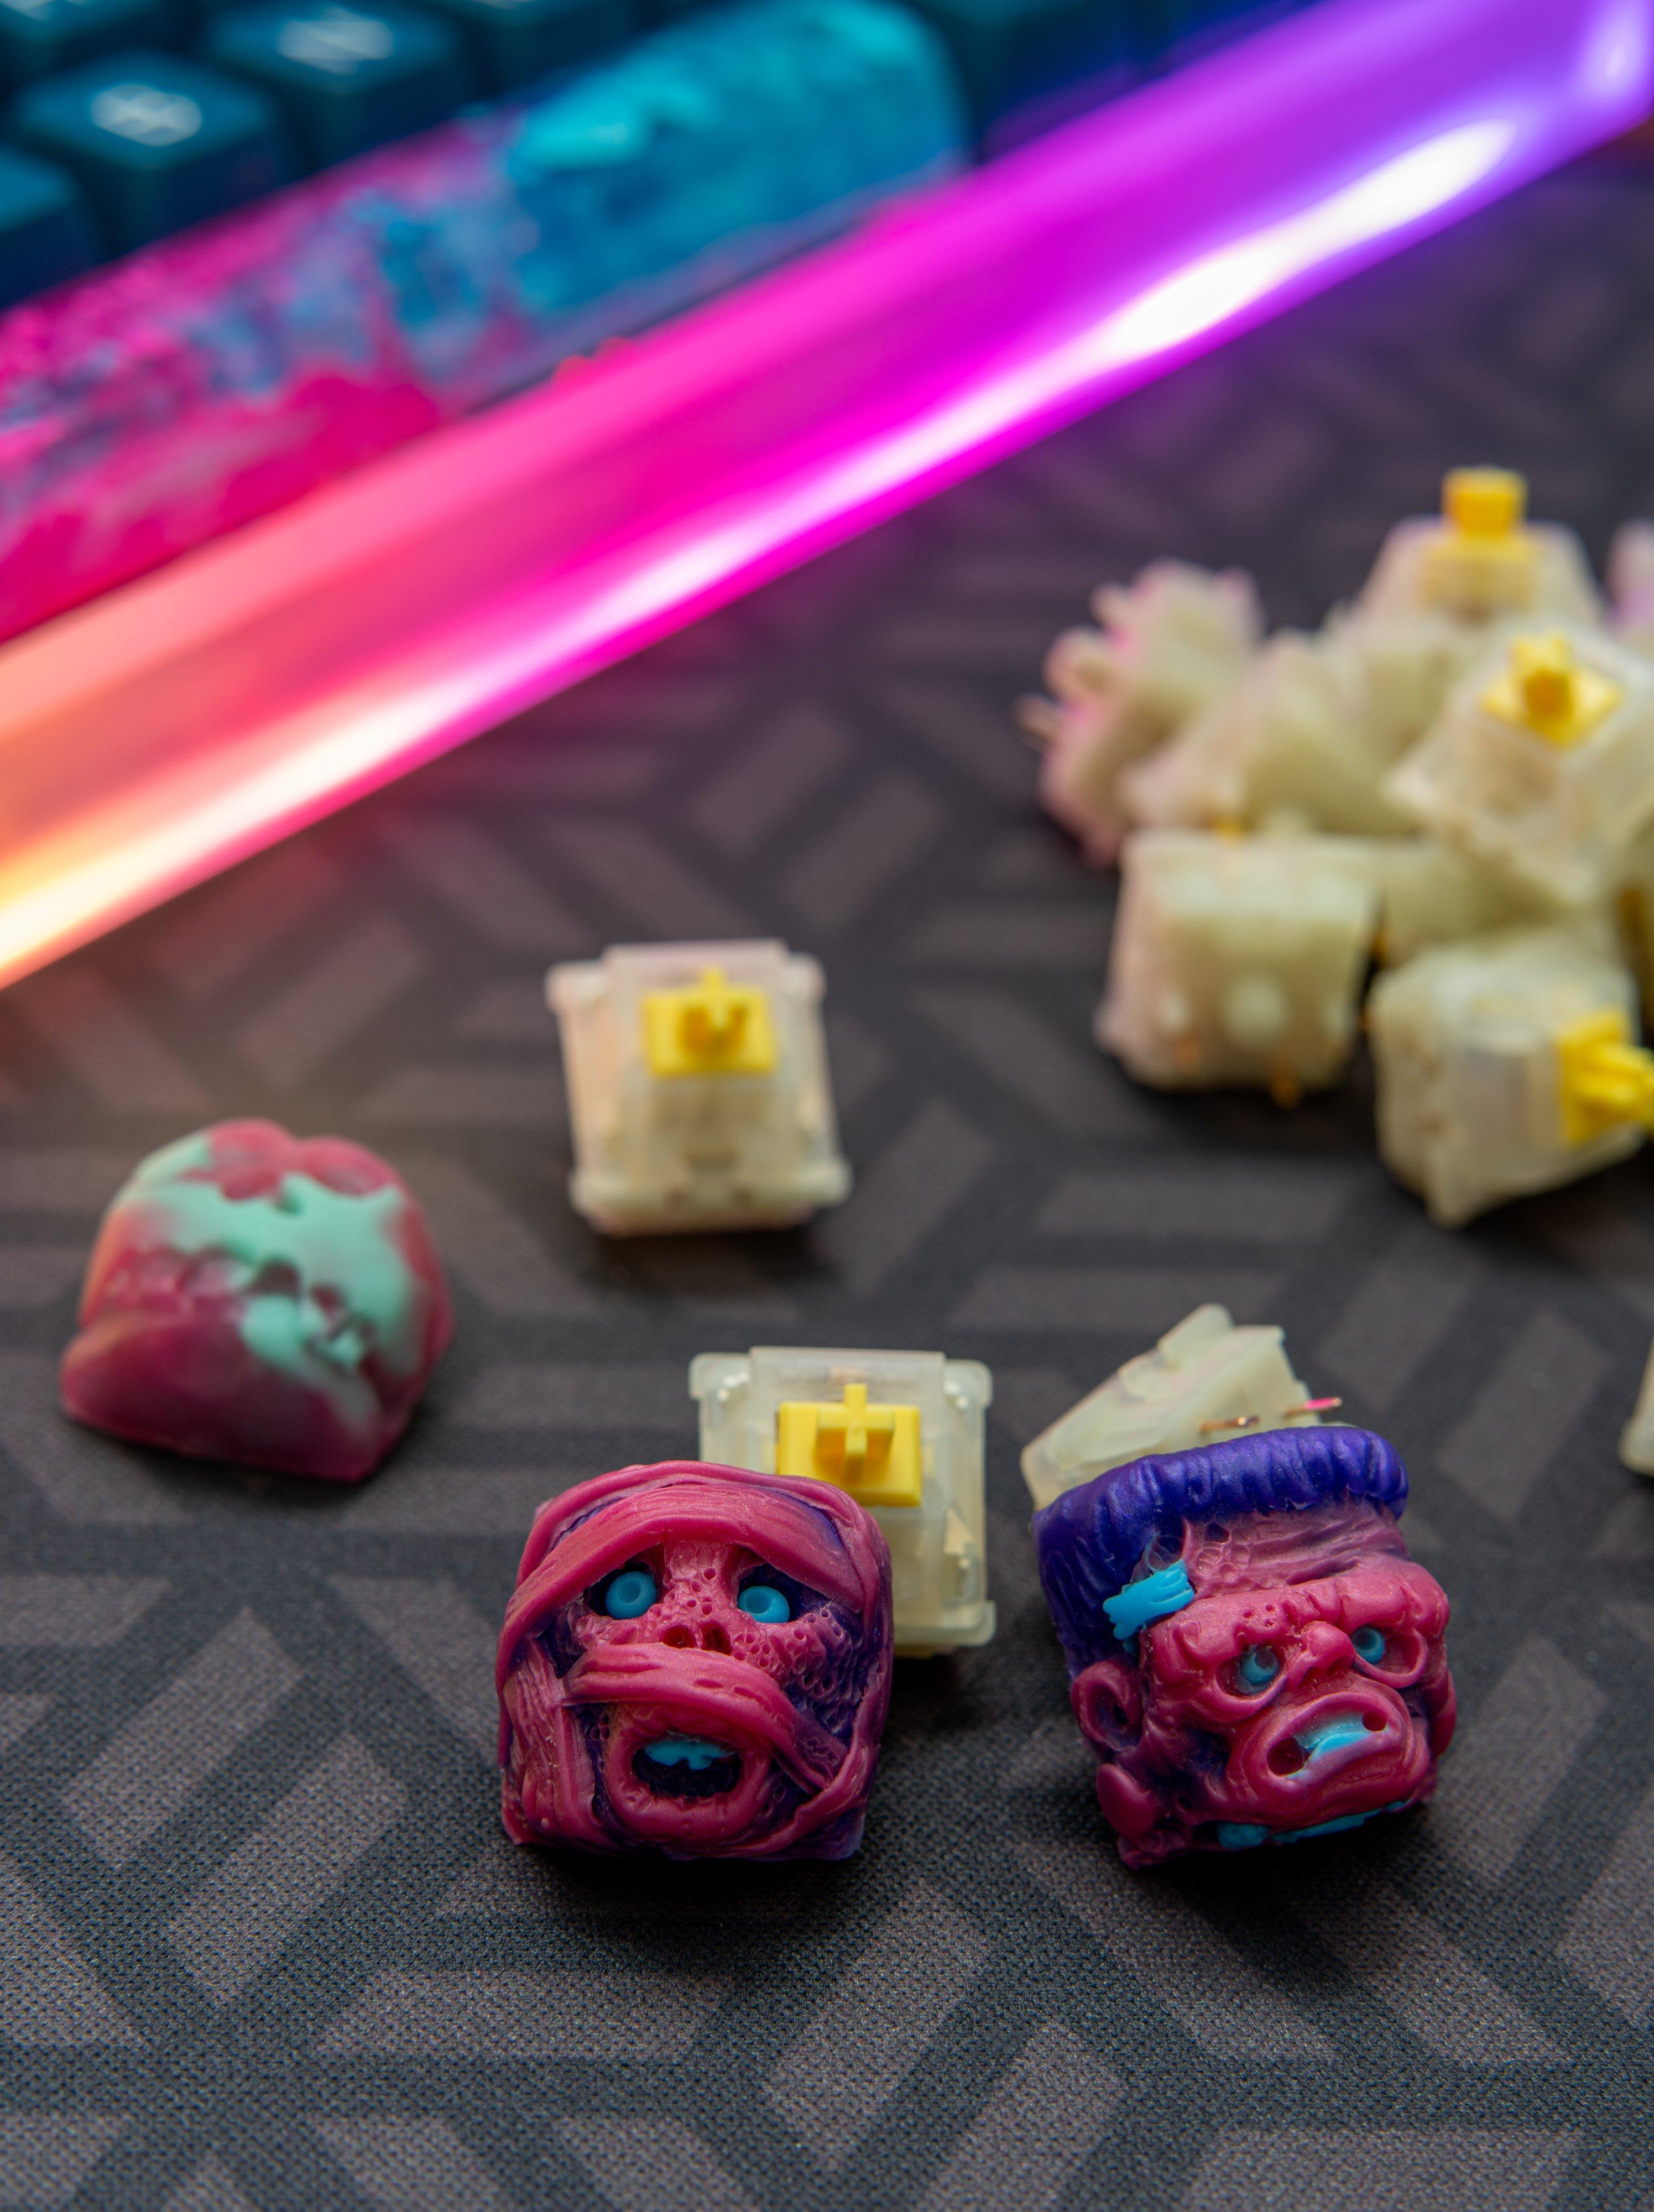 artisan keycaps